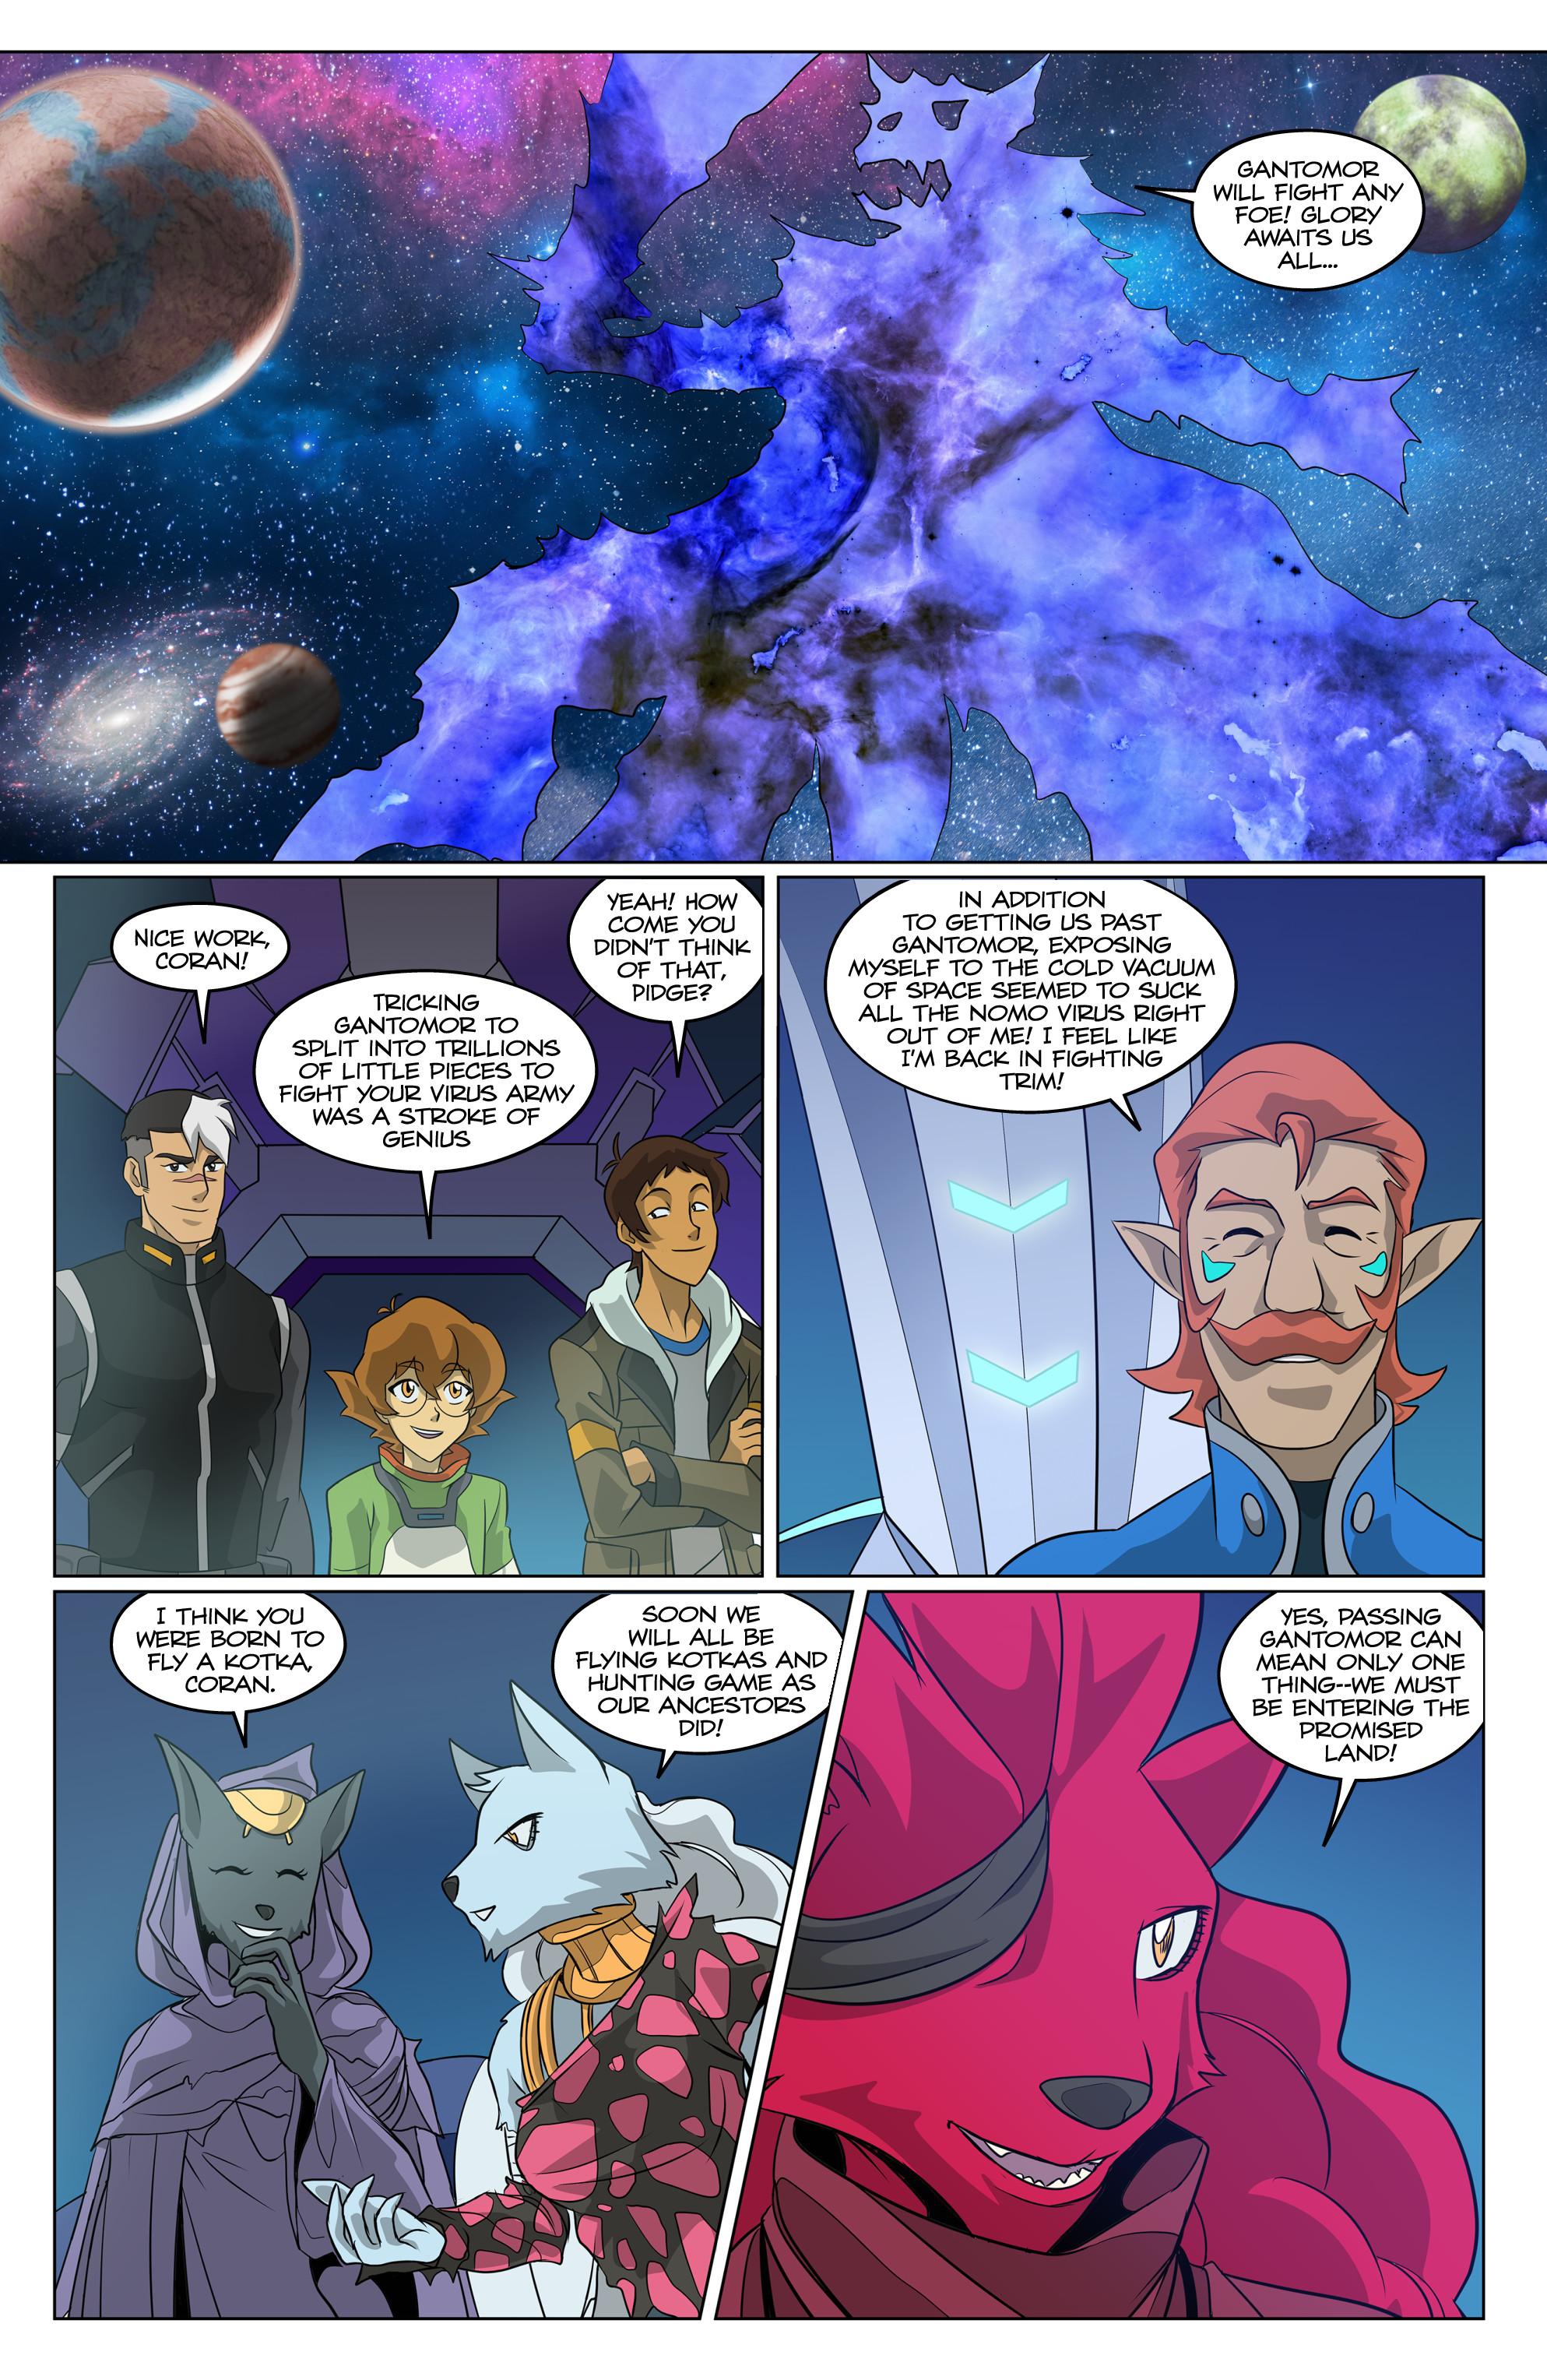 Voltron Legendary Defender Vol  2 (2017) Chapter 3 - Page 25